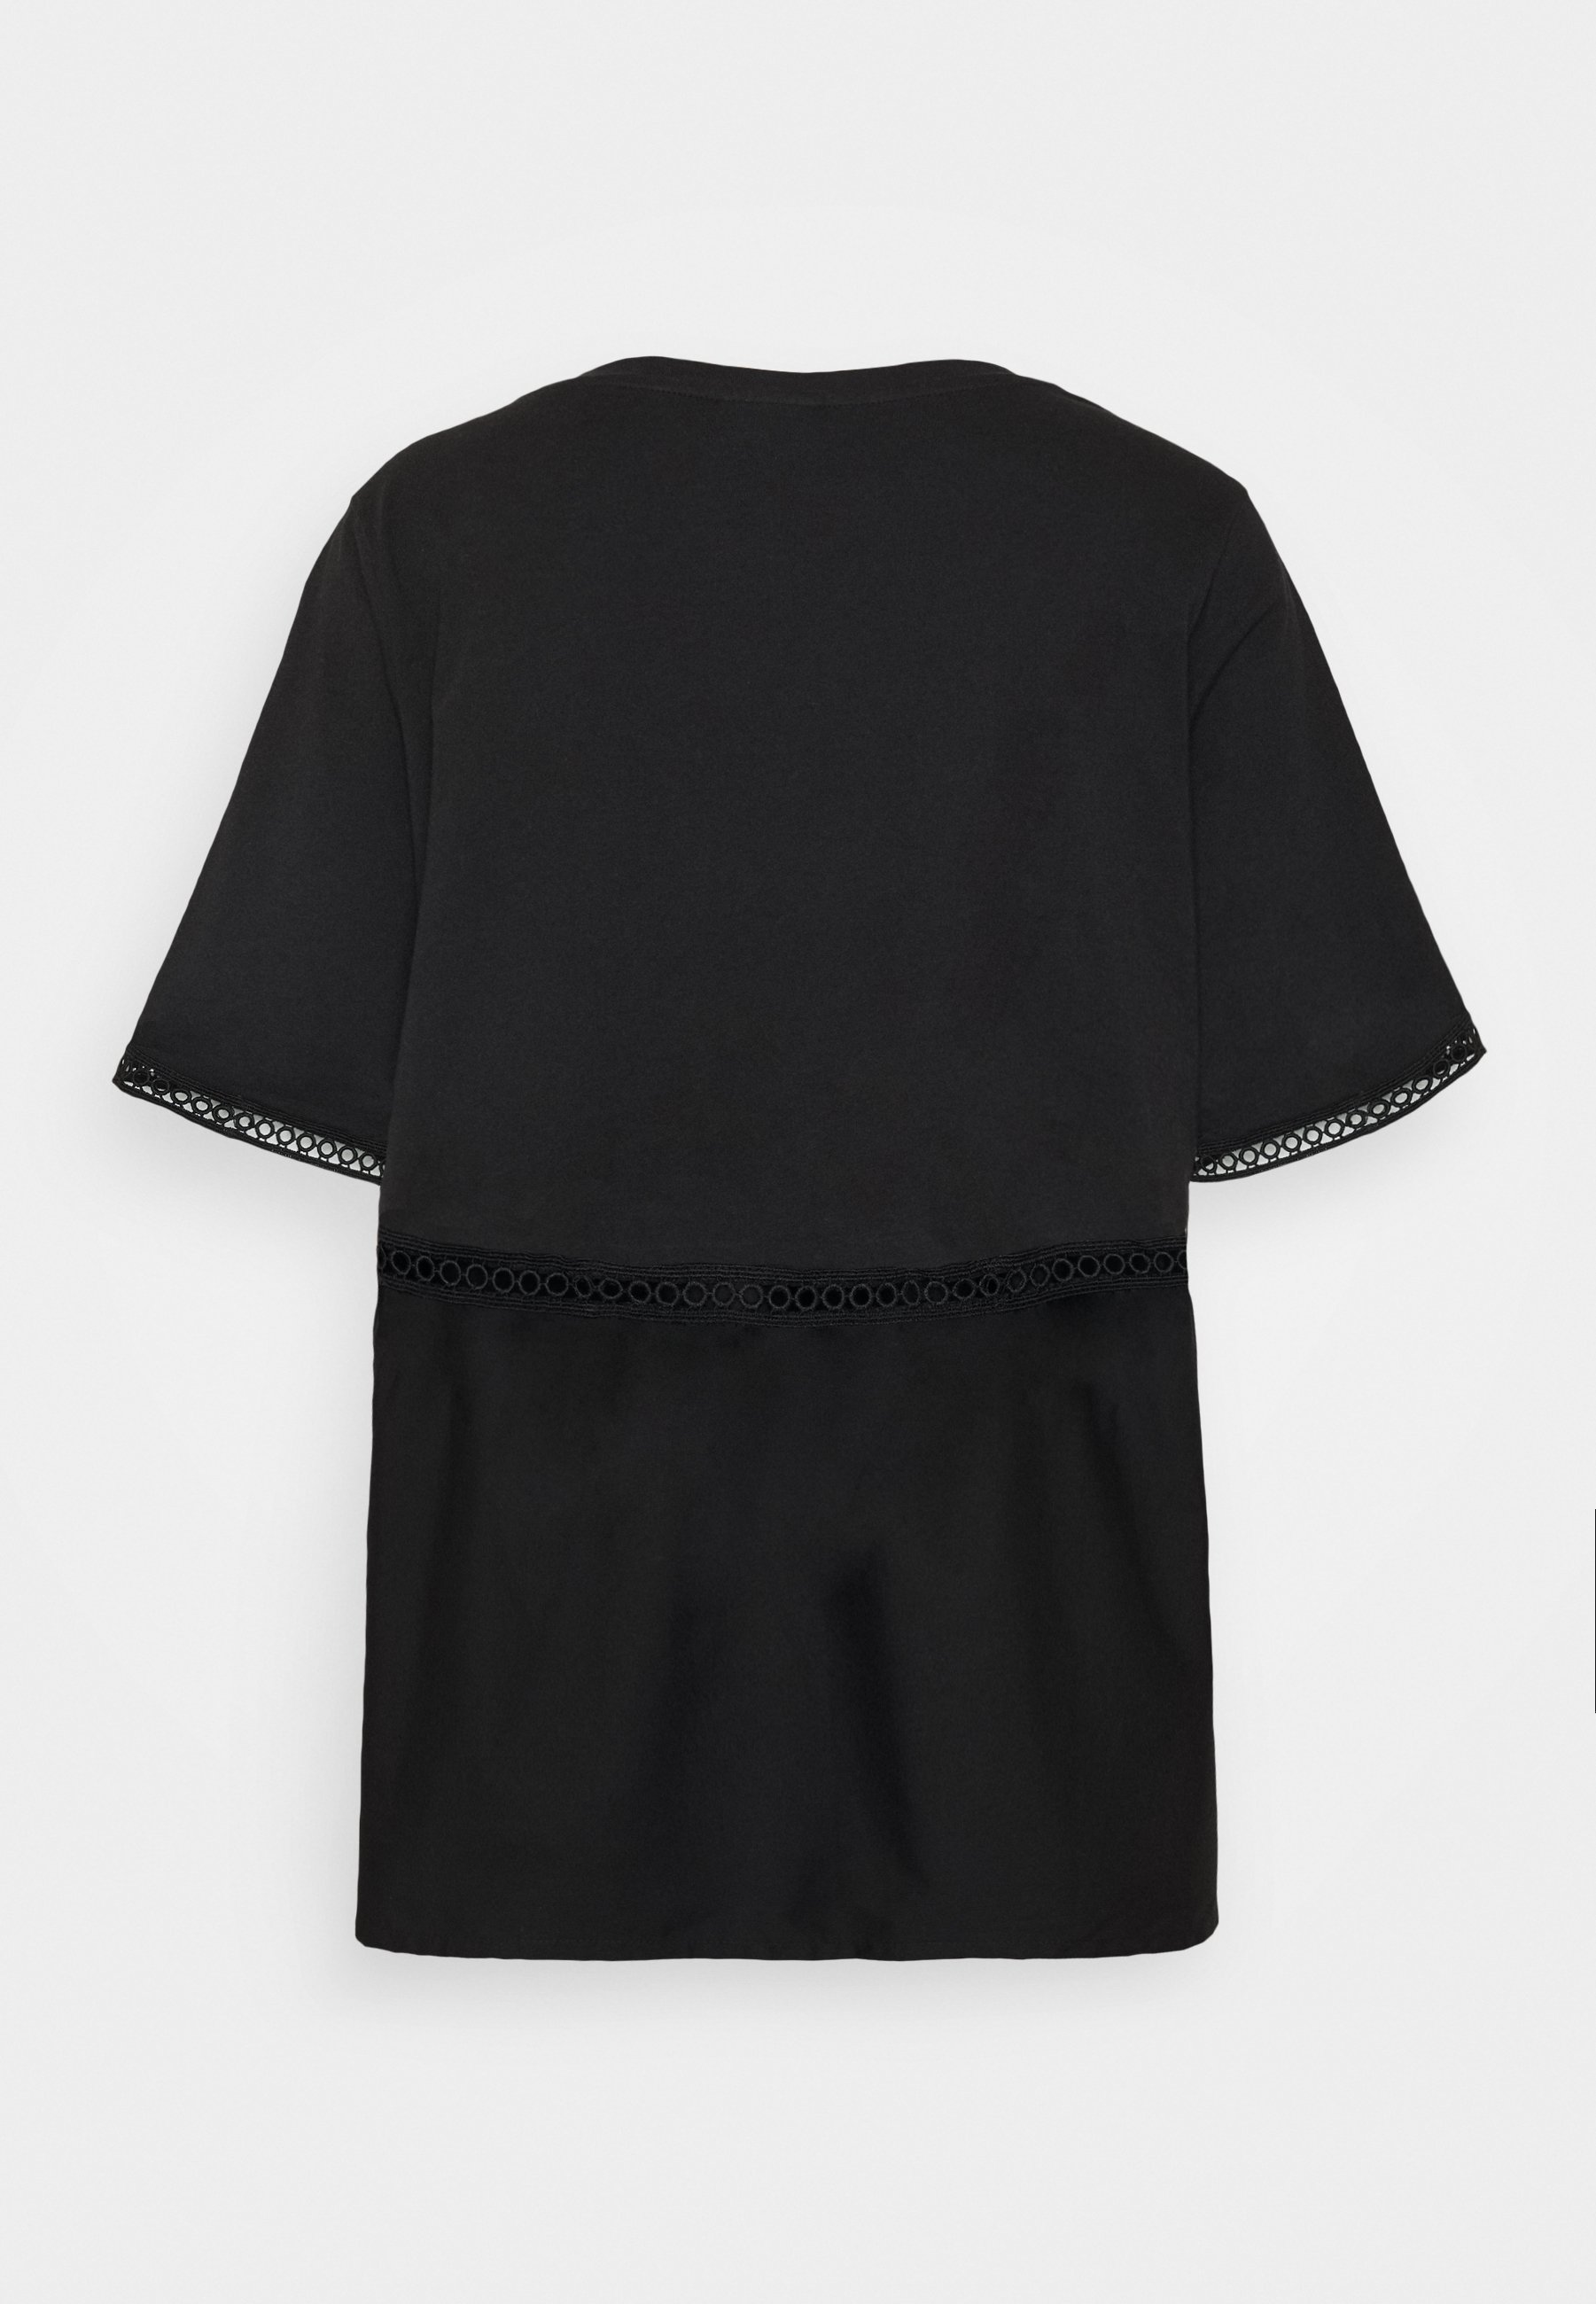 Noisy May Nmteria Loose Top - T-shirts Black/svart